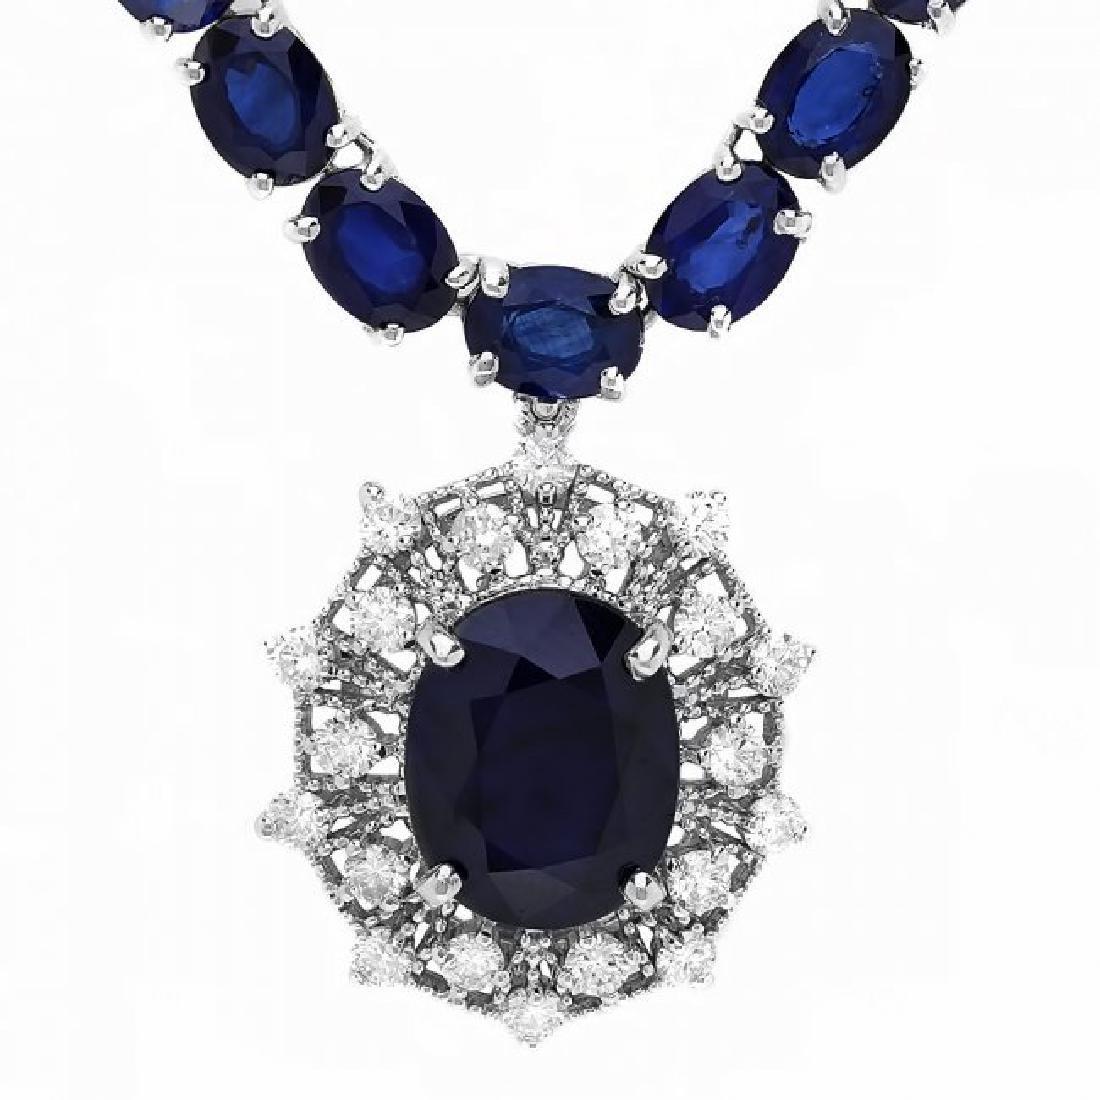 14k Gold 58ct Sapphire 1.15ct Diamond Necklace - 3